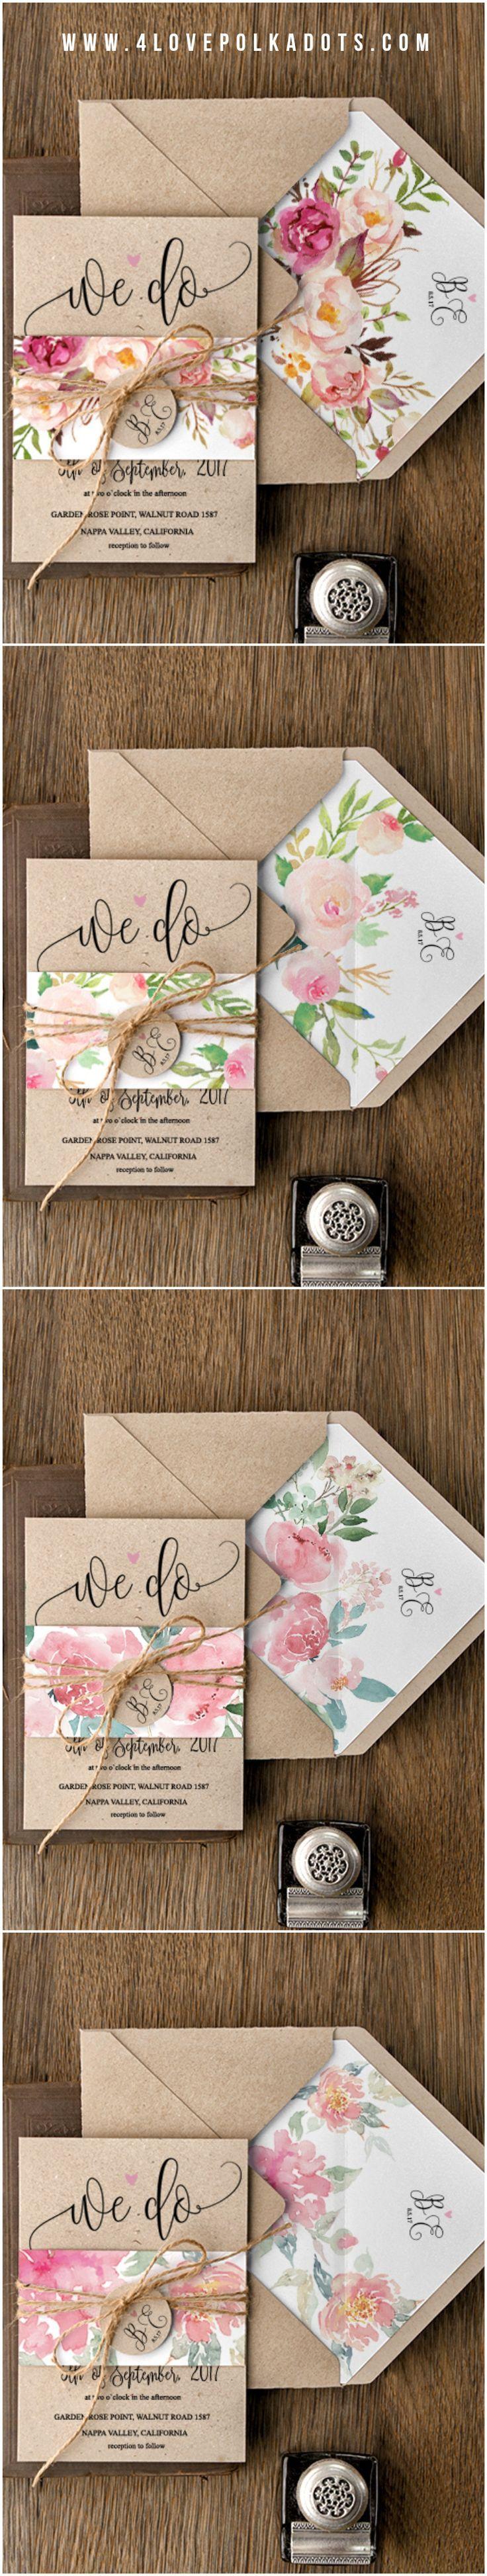 inexpensive wedding invitations cheap wedding invites Budget wedding hacks